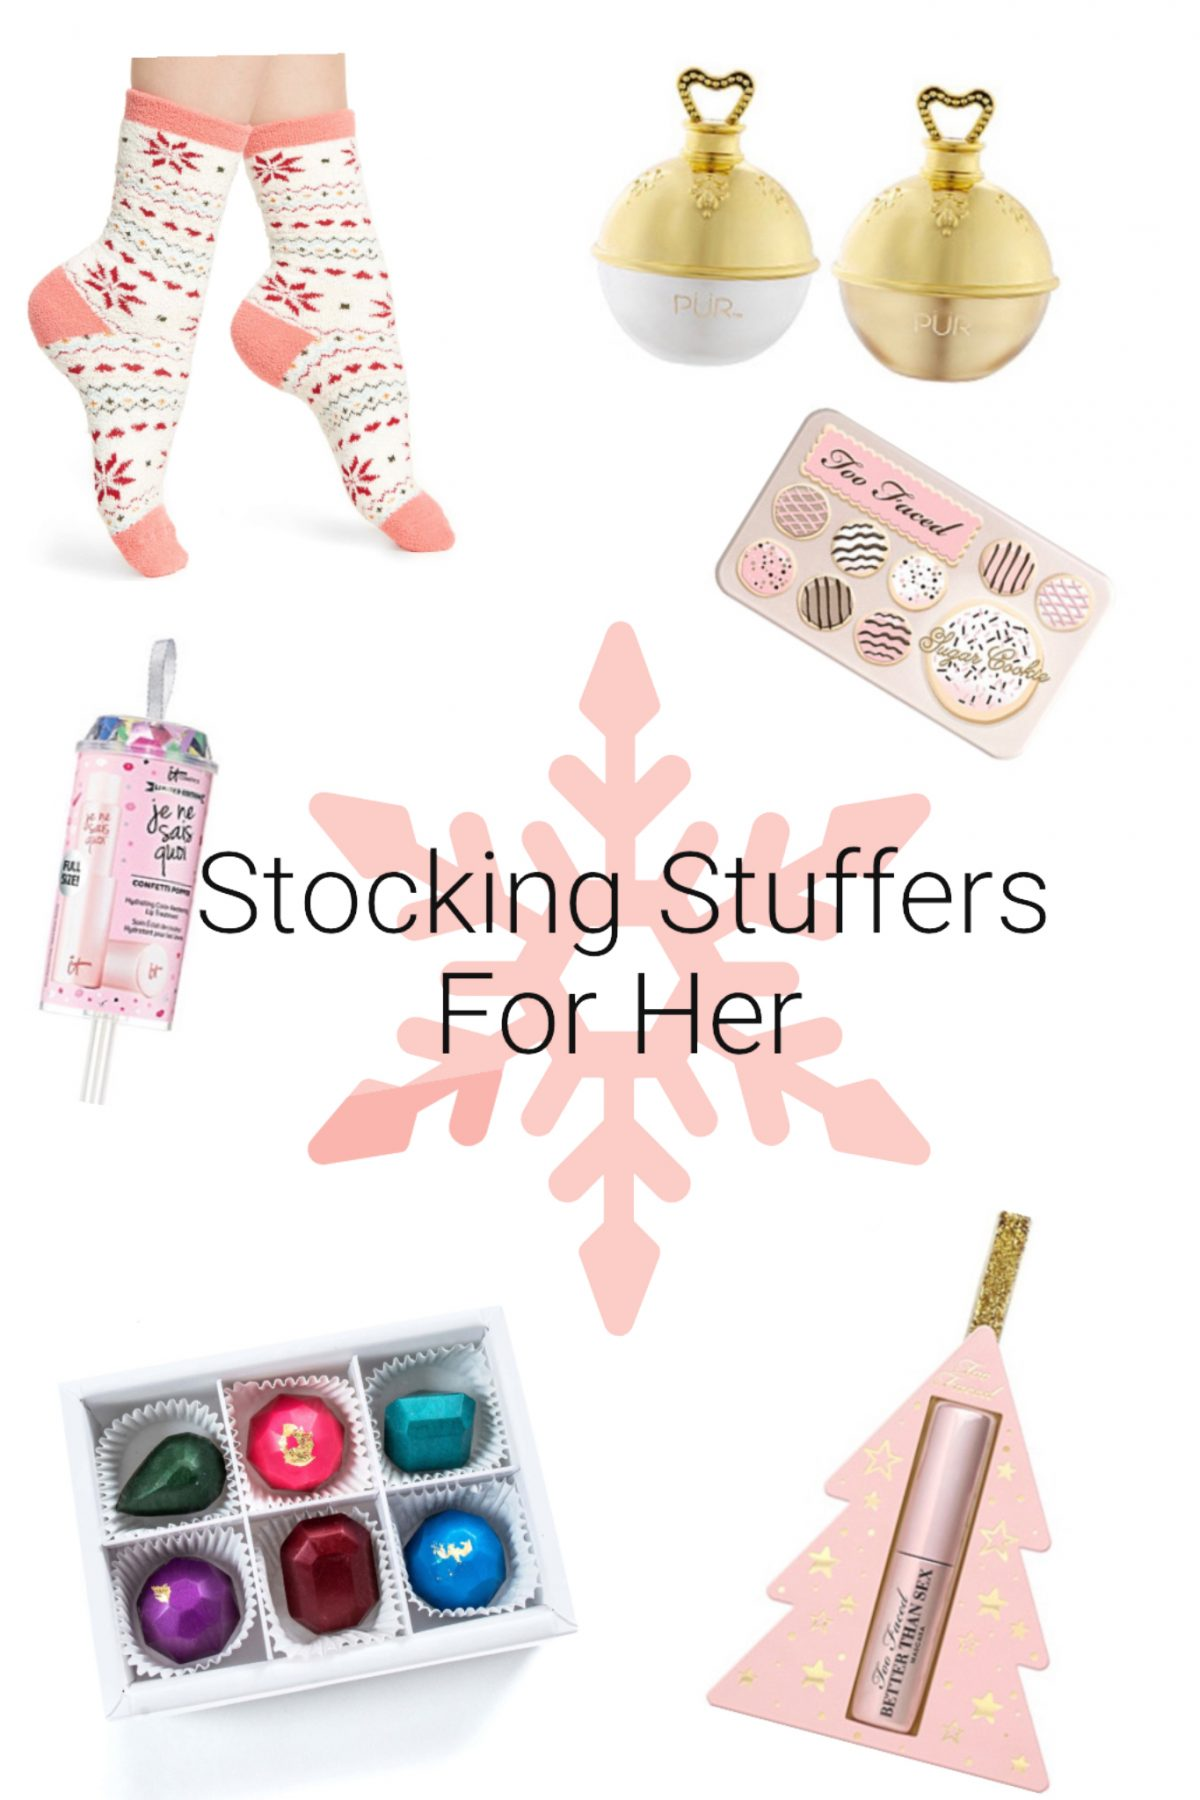 Stocking Stuffer Christmas Gift Ideas For Women   . Stocking Stuffers For All Women. Makeup, Skincare, chocolate, fuzzy socks, you name it!